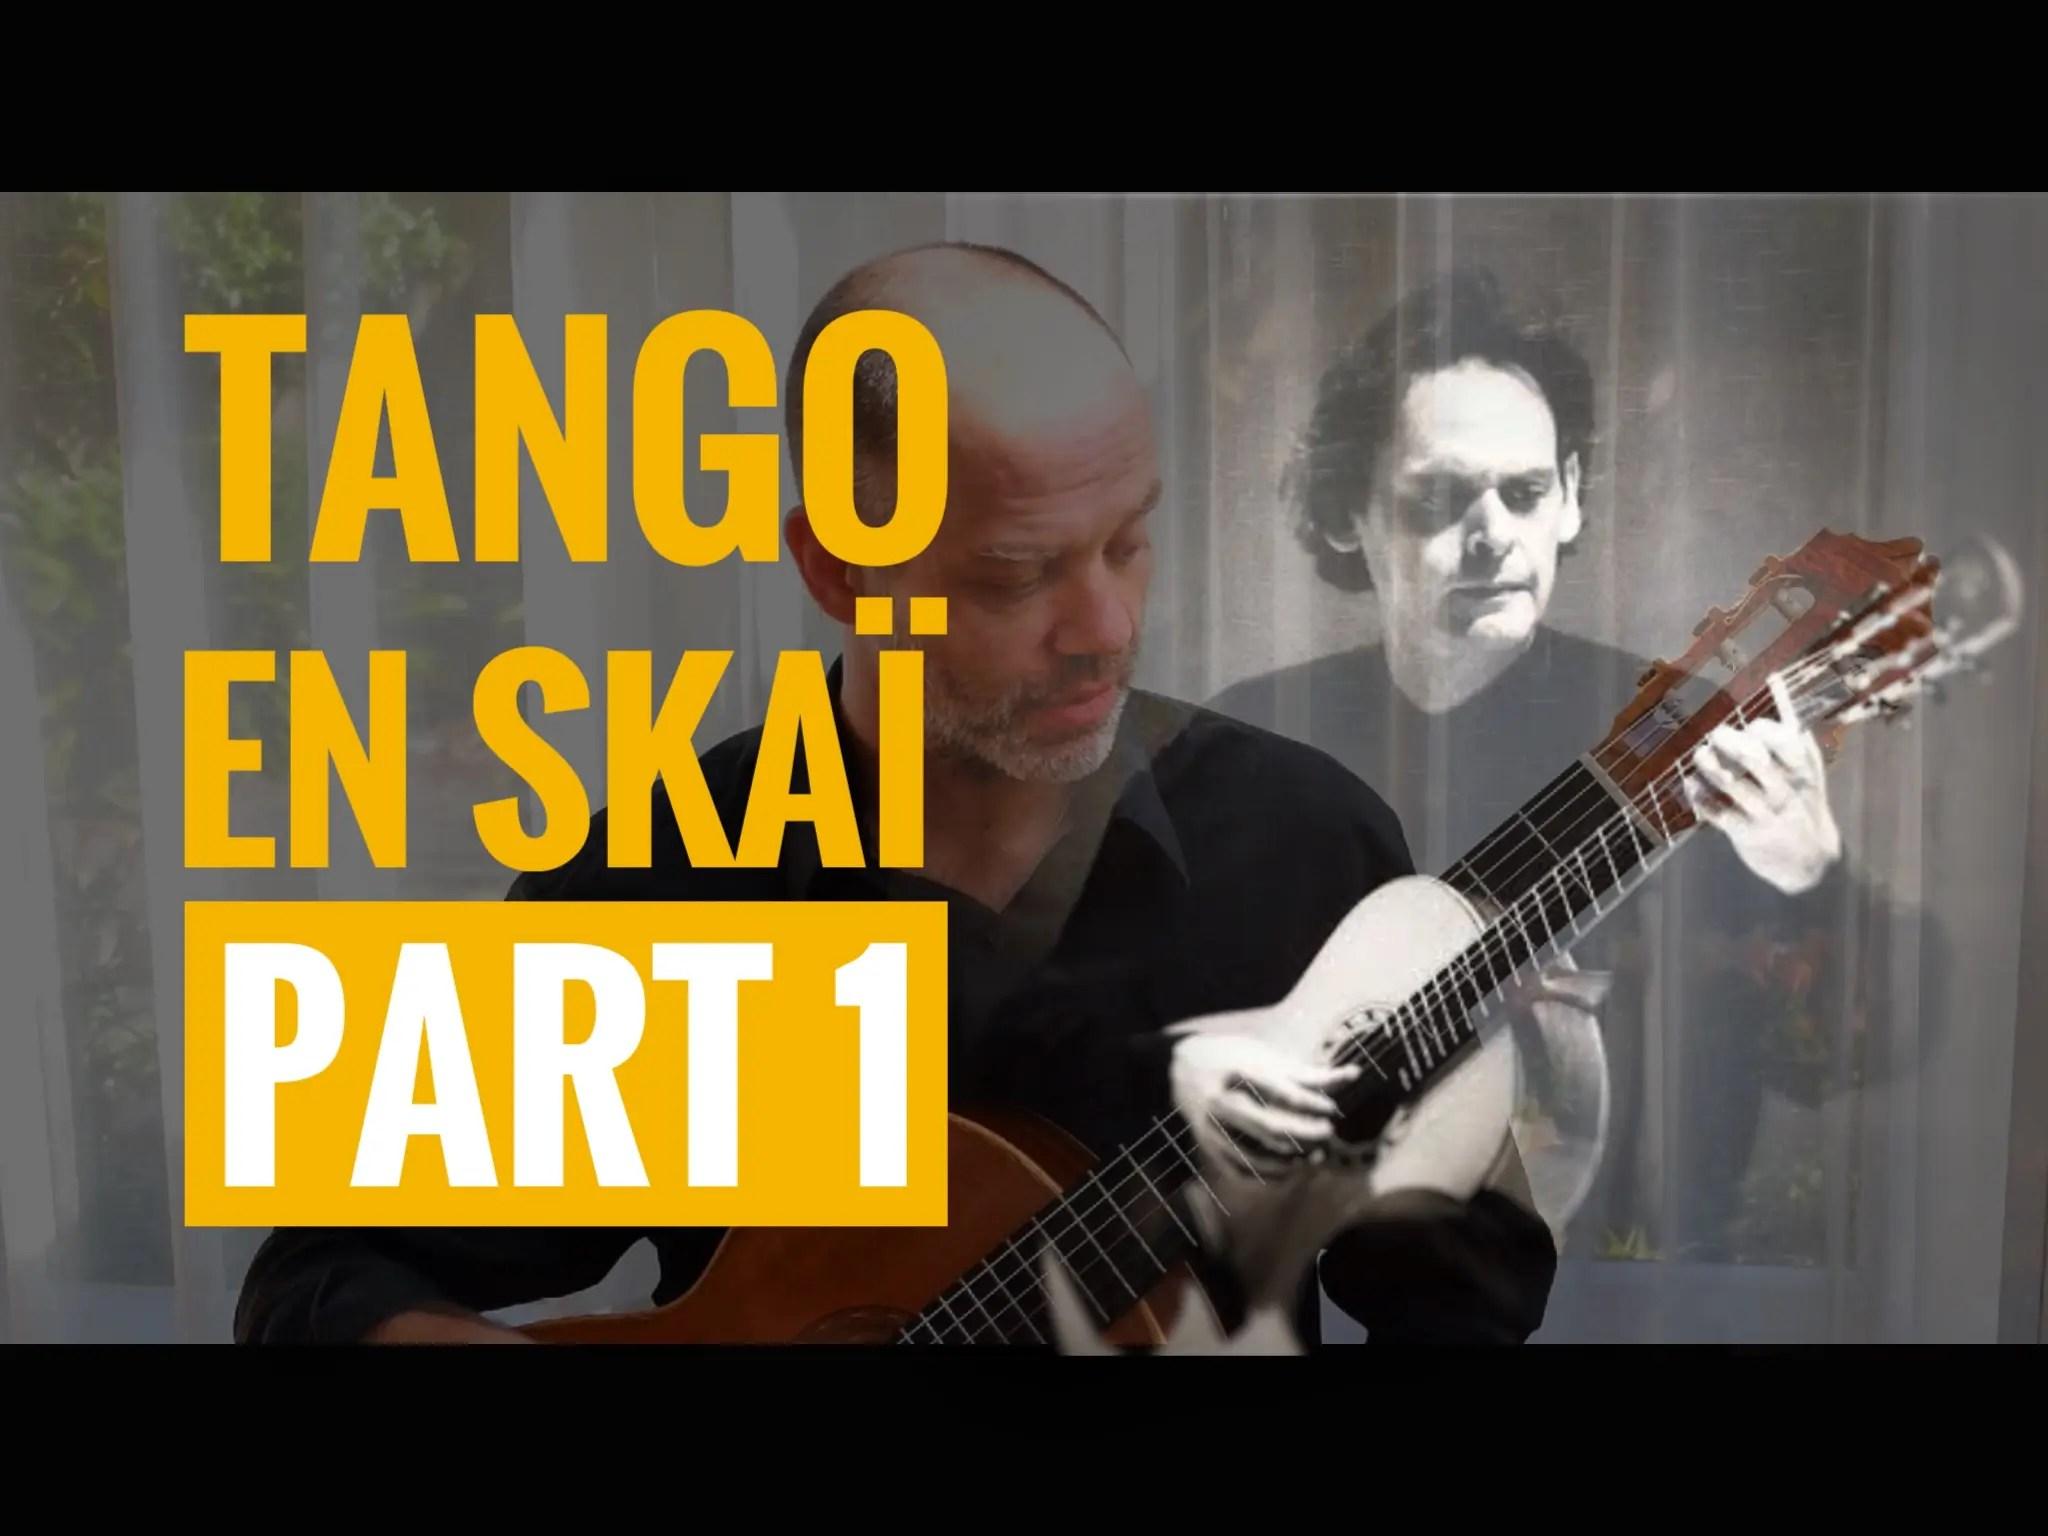 Approaching Tango en Skai Roland Dyens